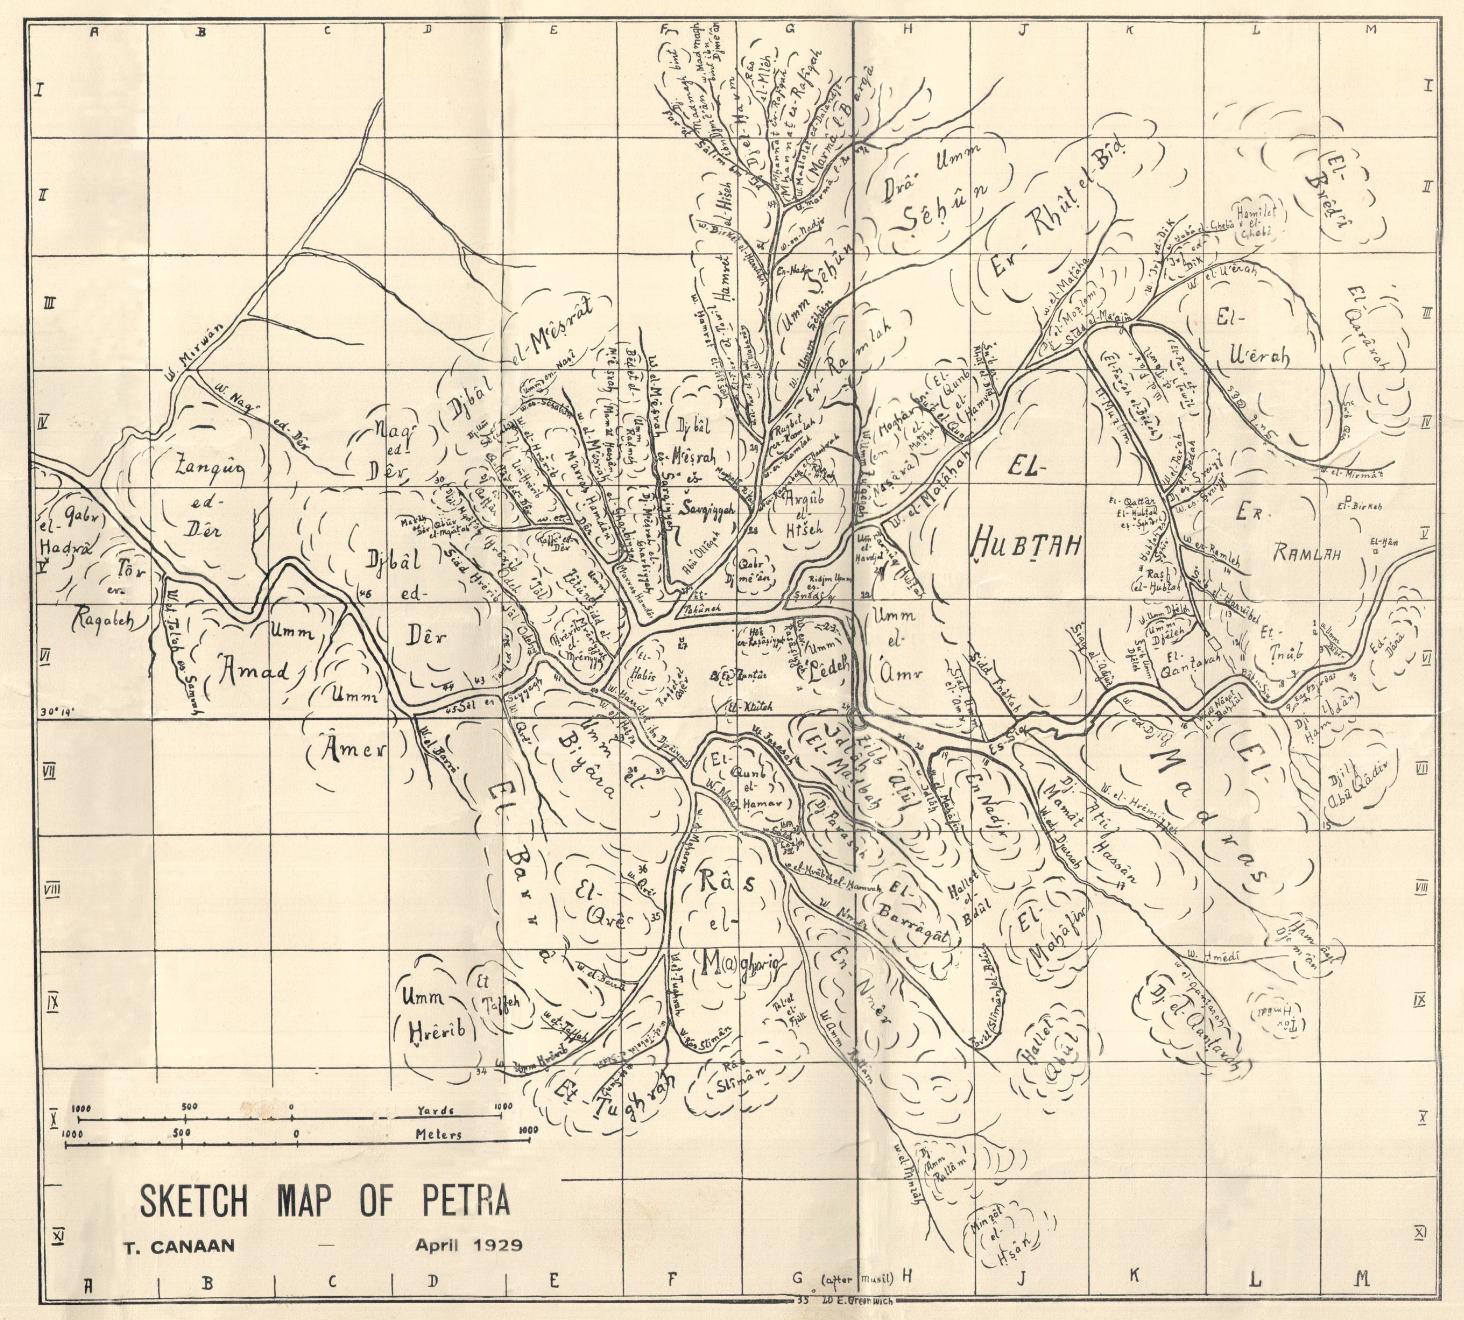 Sketch Map of Petra - خارطة مبدئية للبتراء